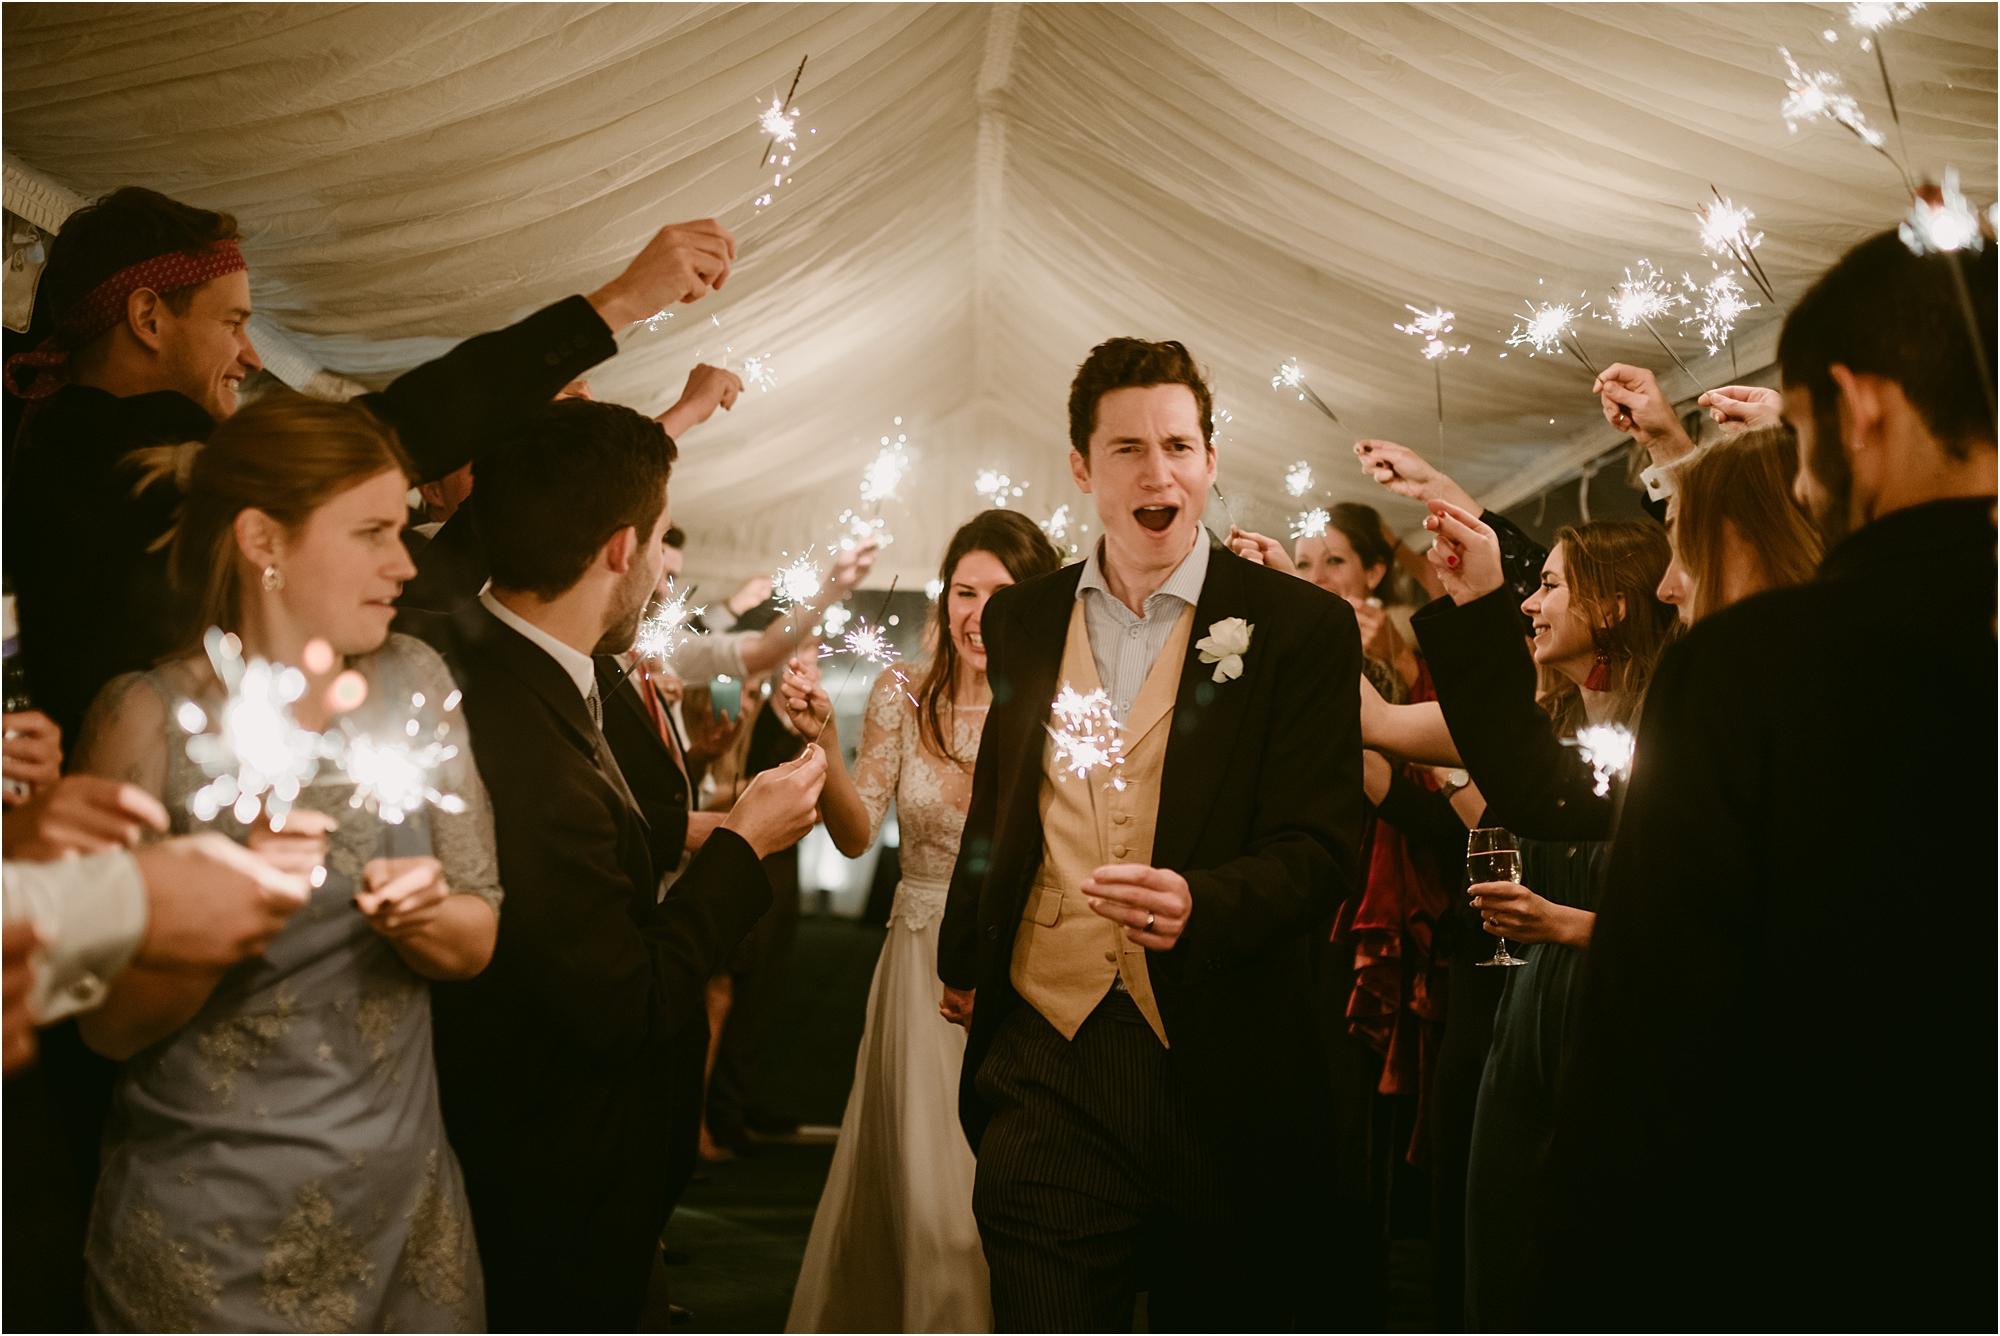 Rose+Harry-outdoor-english-wedding-photography__0129.jpg